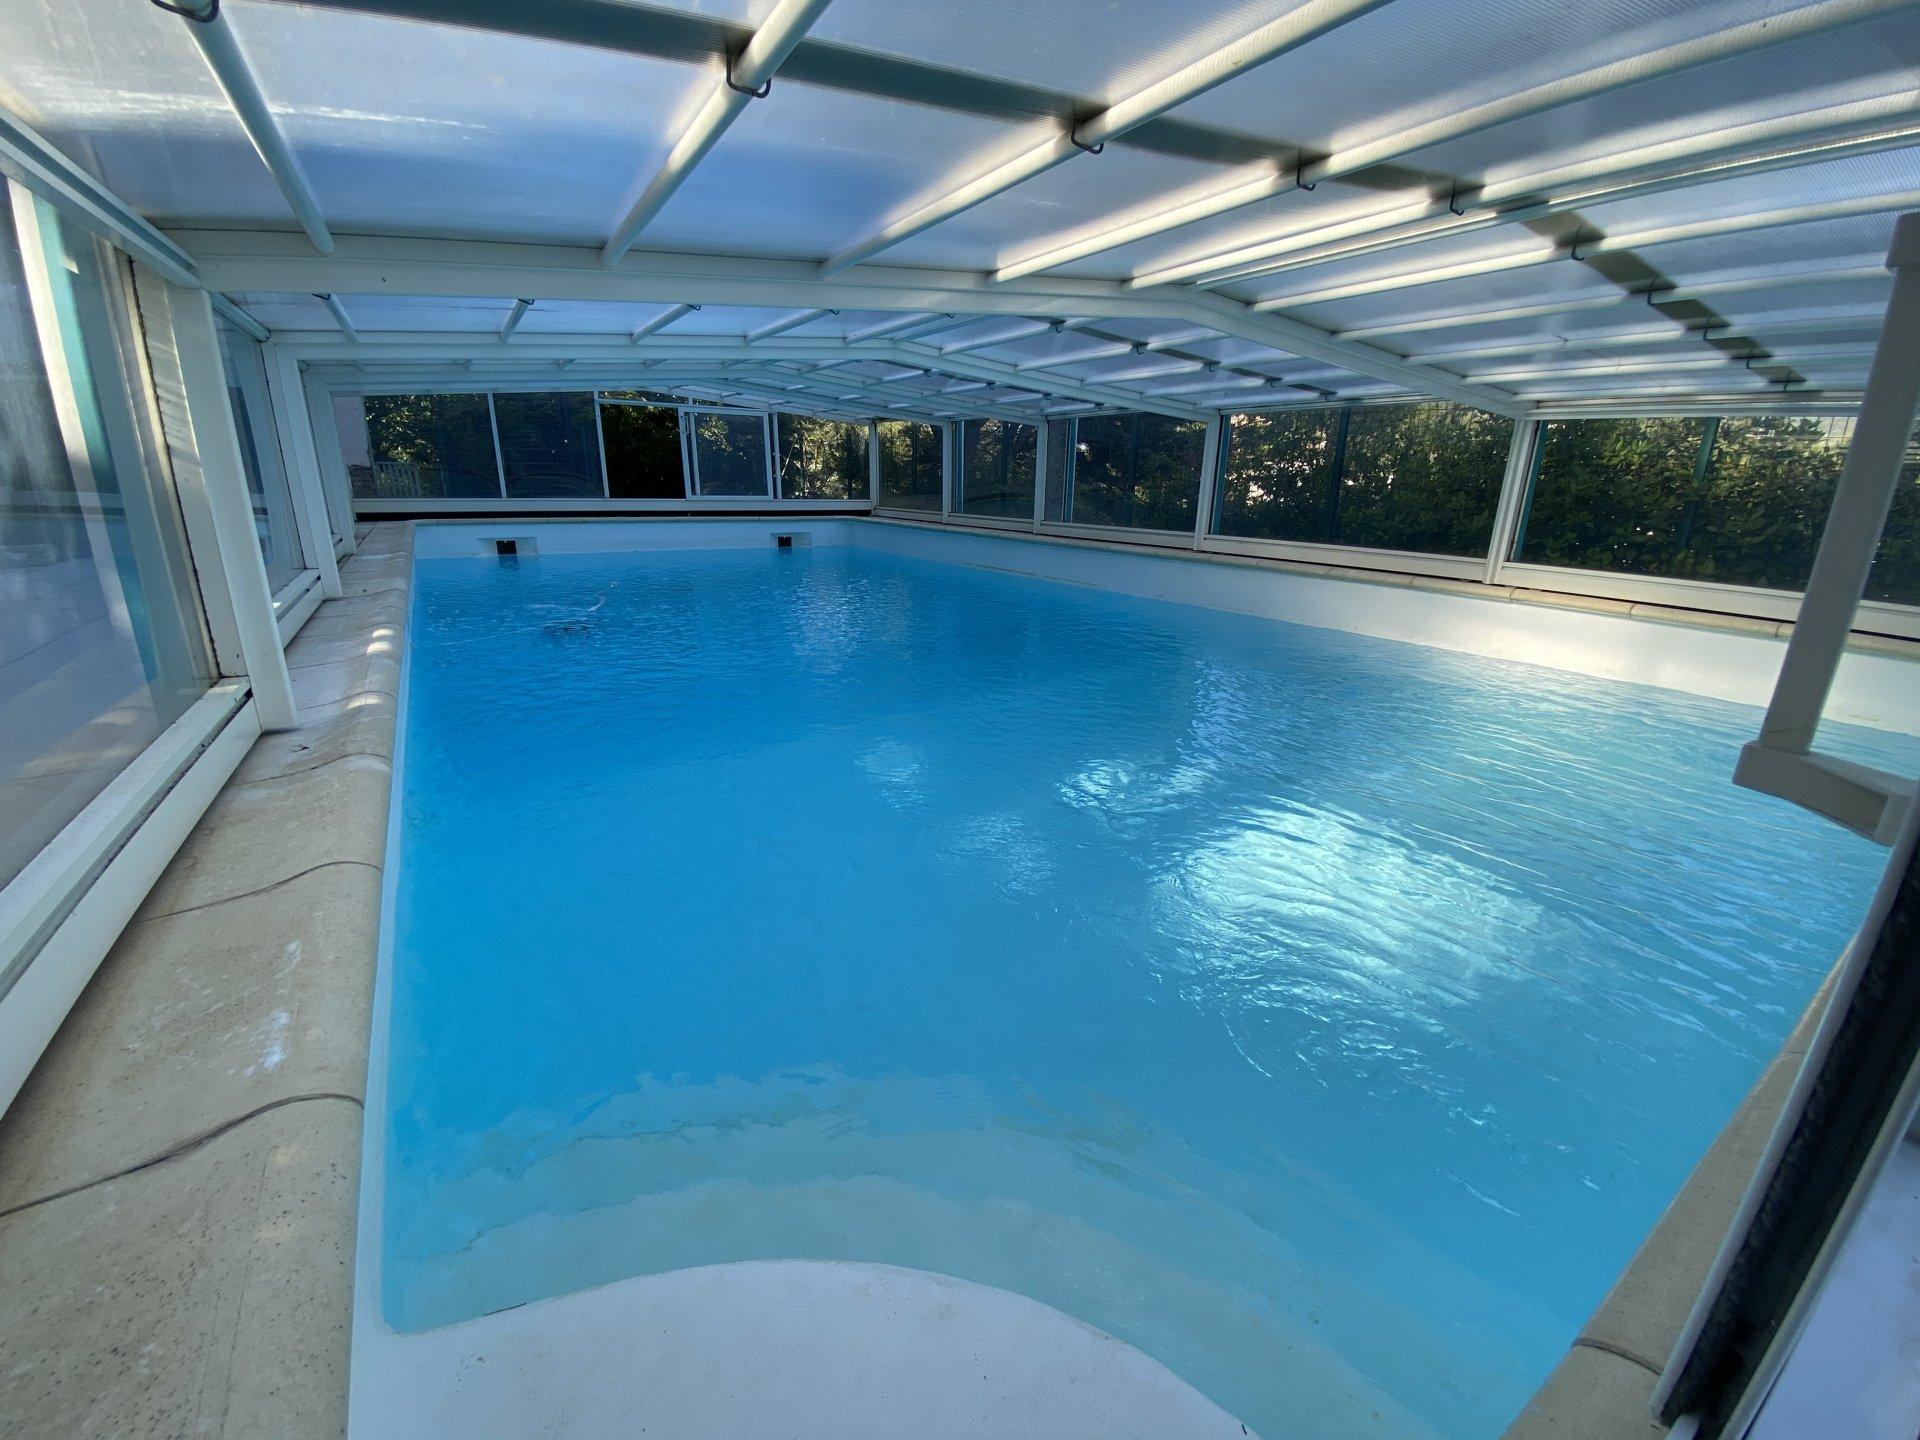 Villa 170 m2, T4 + 2 logements, terrain, piscine